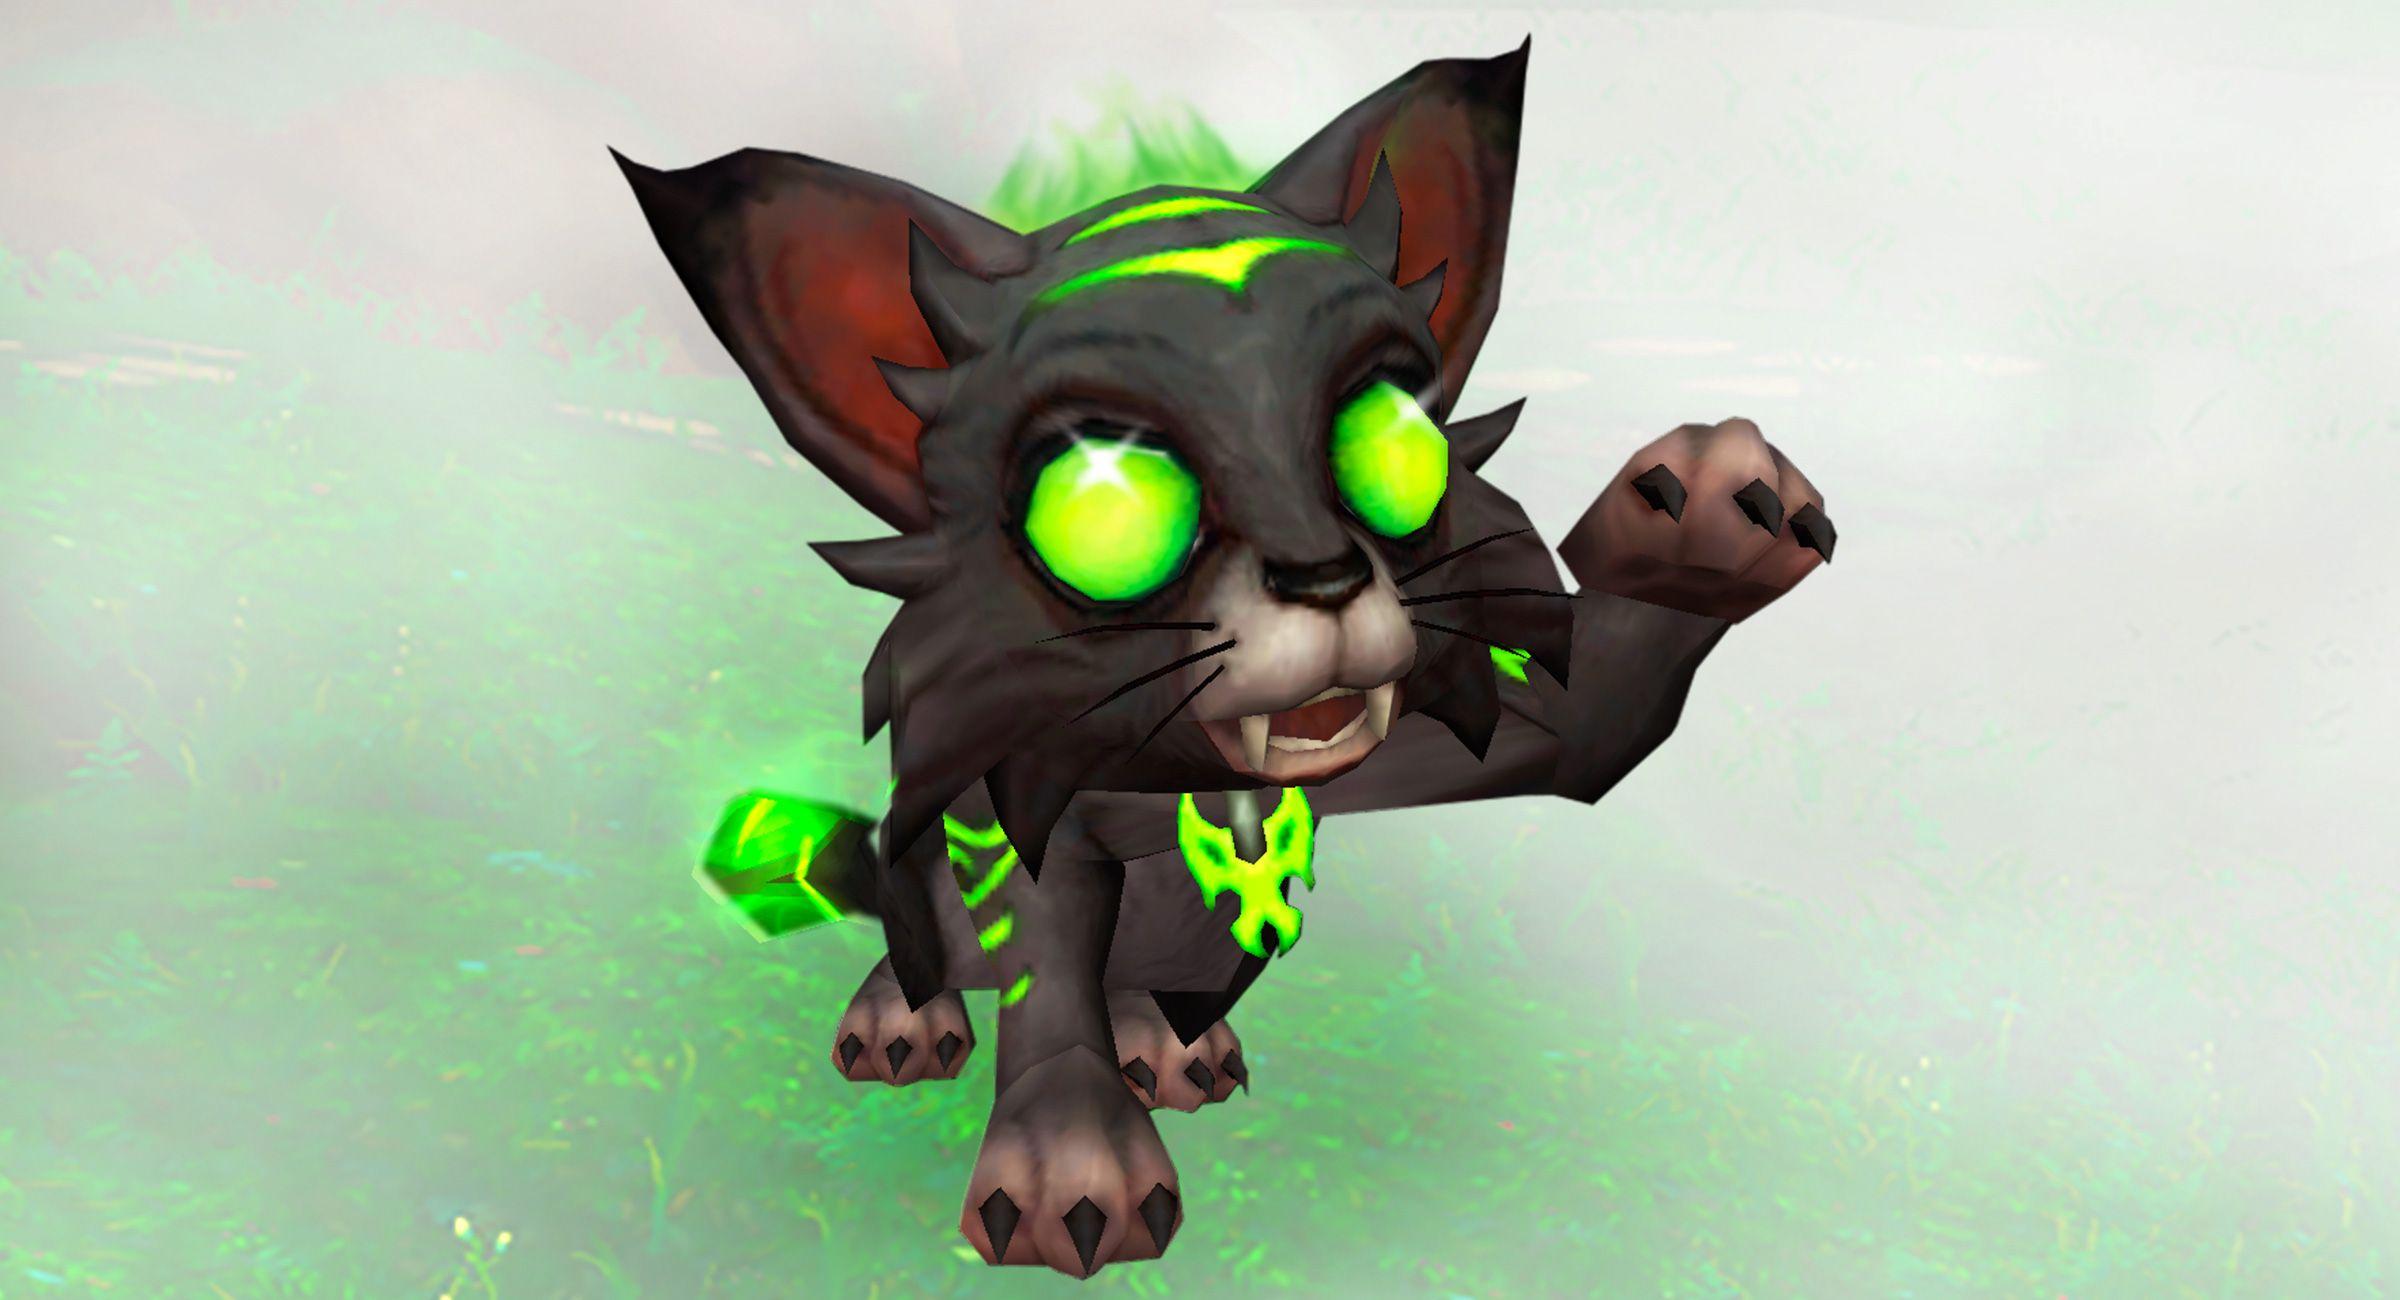 World Of Warcraft Players Raise 2.5 Million For MakeA